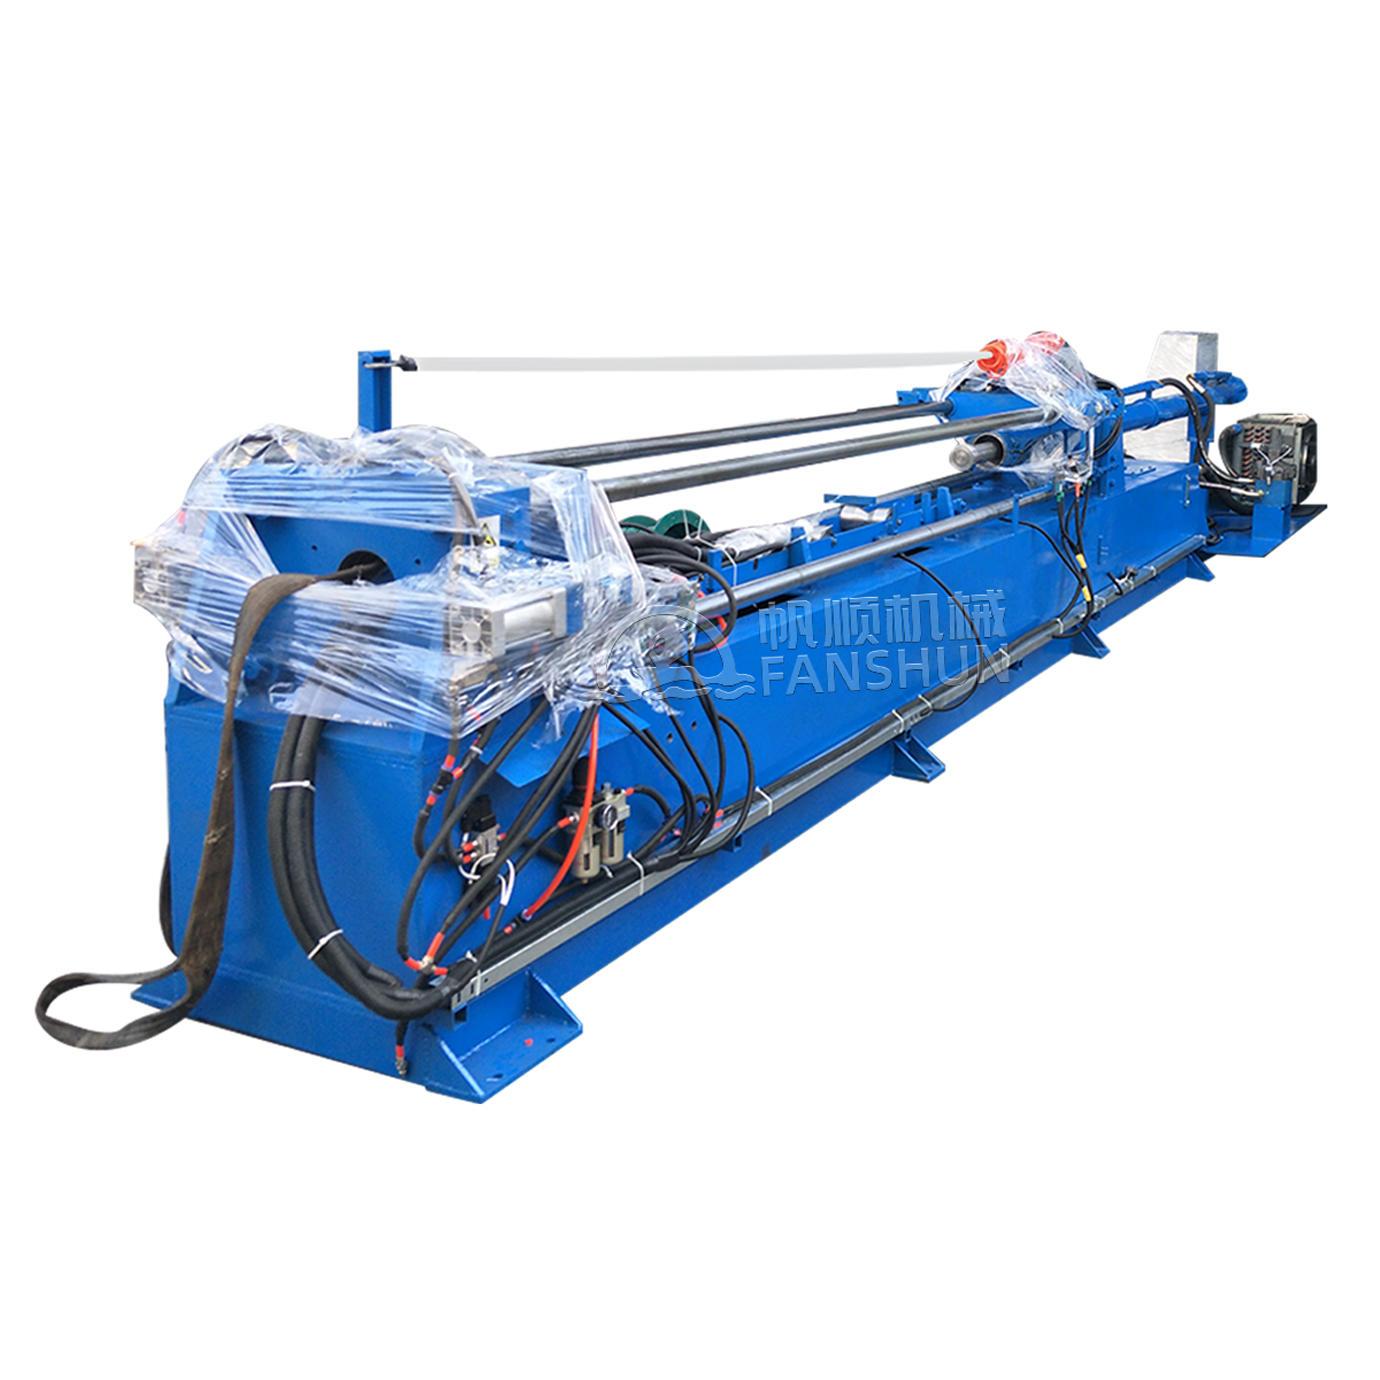 150mm Push Peeling Machine